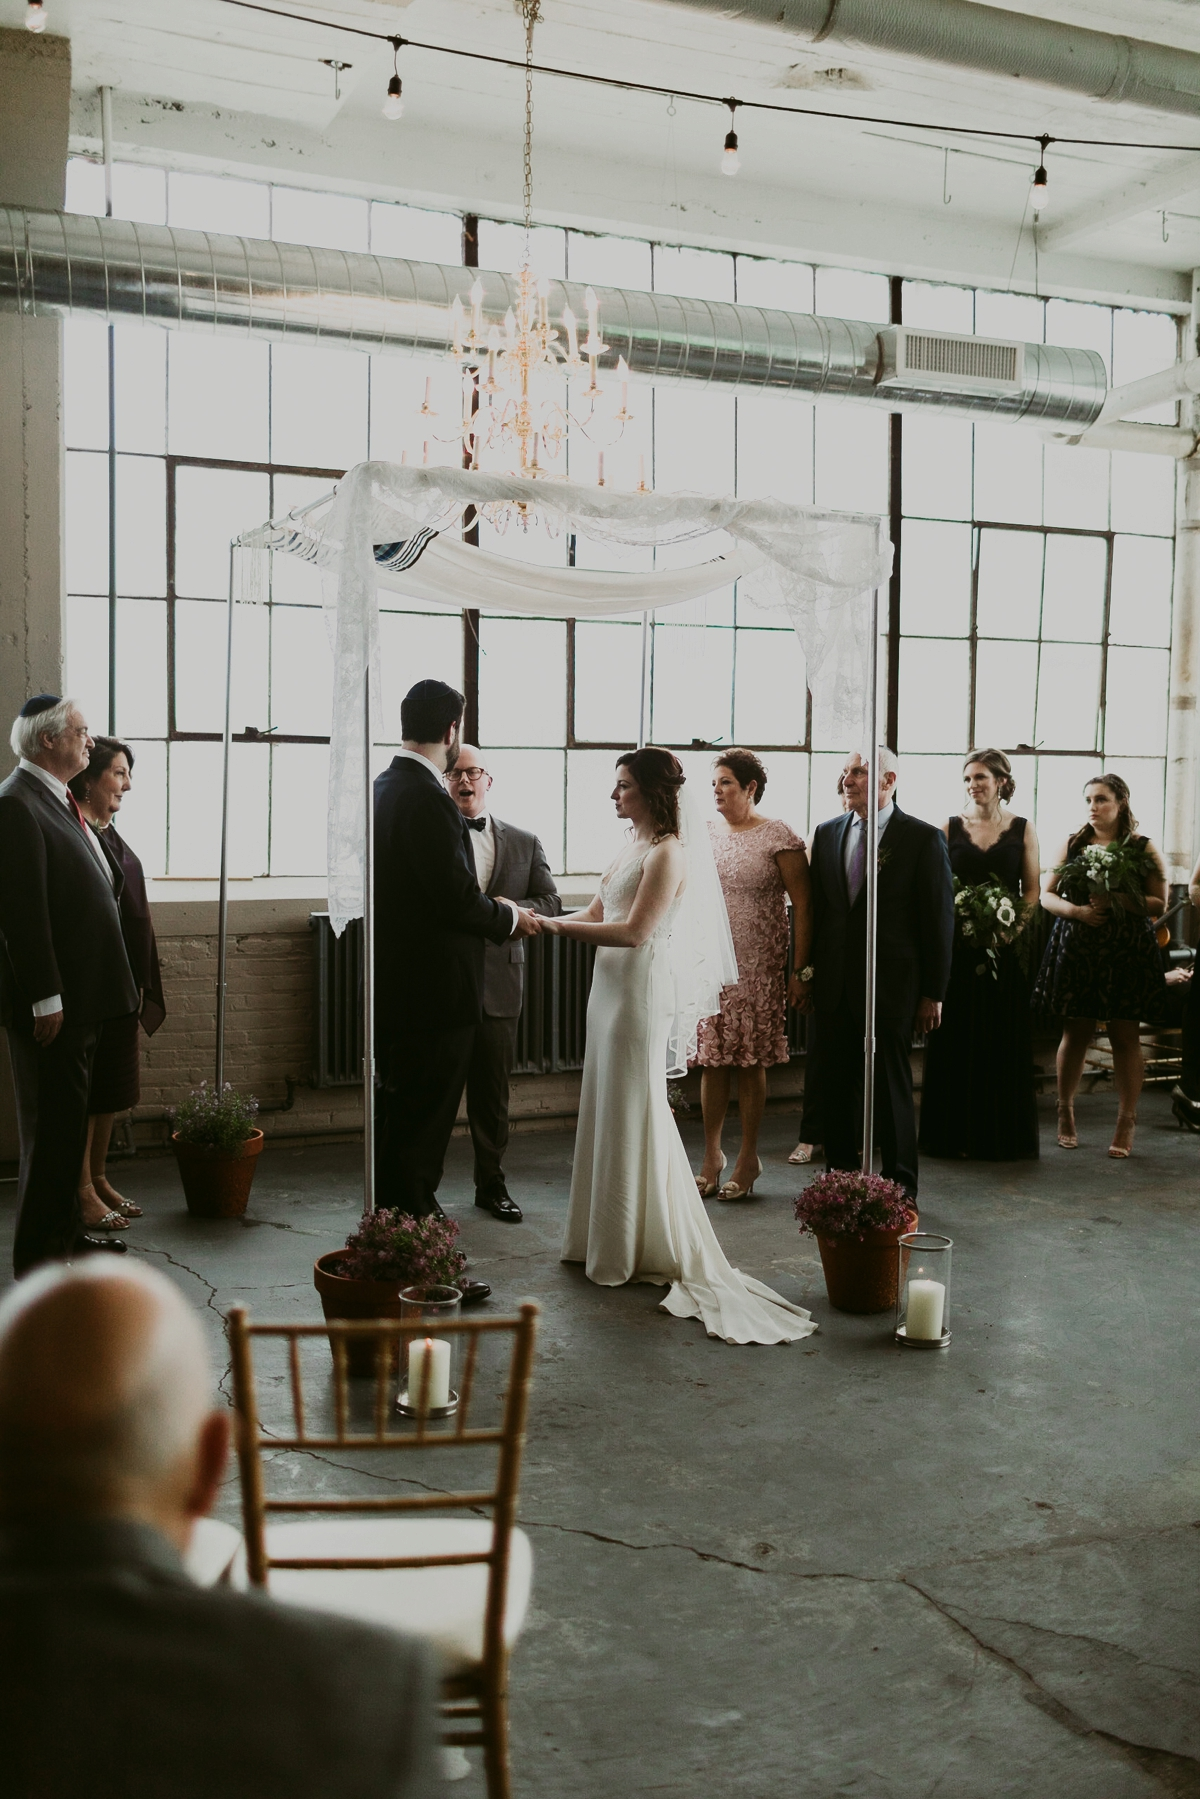 Rachel+Michael_Lake-Erie-Building-Cleveland-Wedding_M+J-Photographers-370.jpg